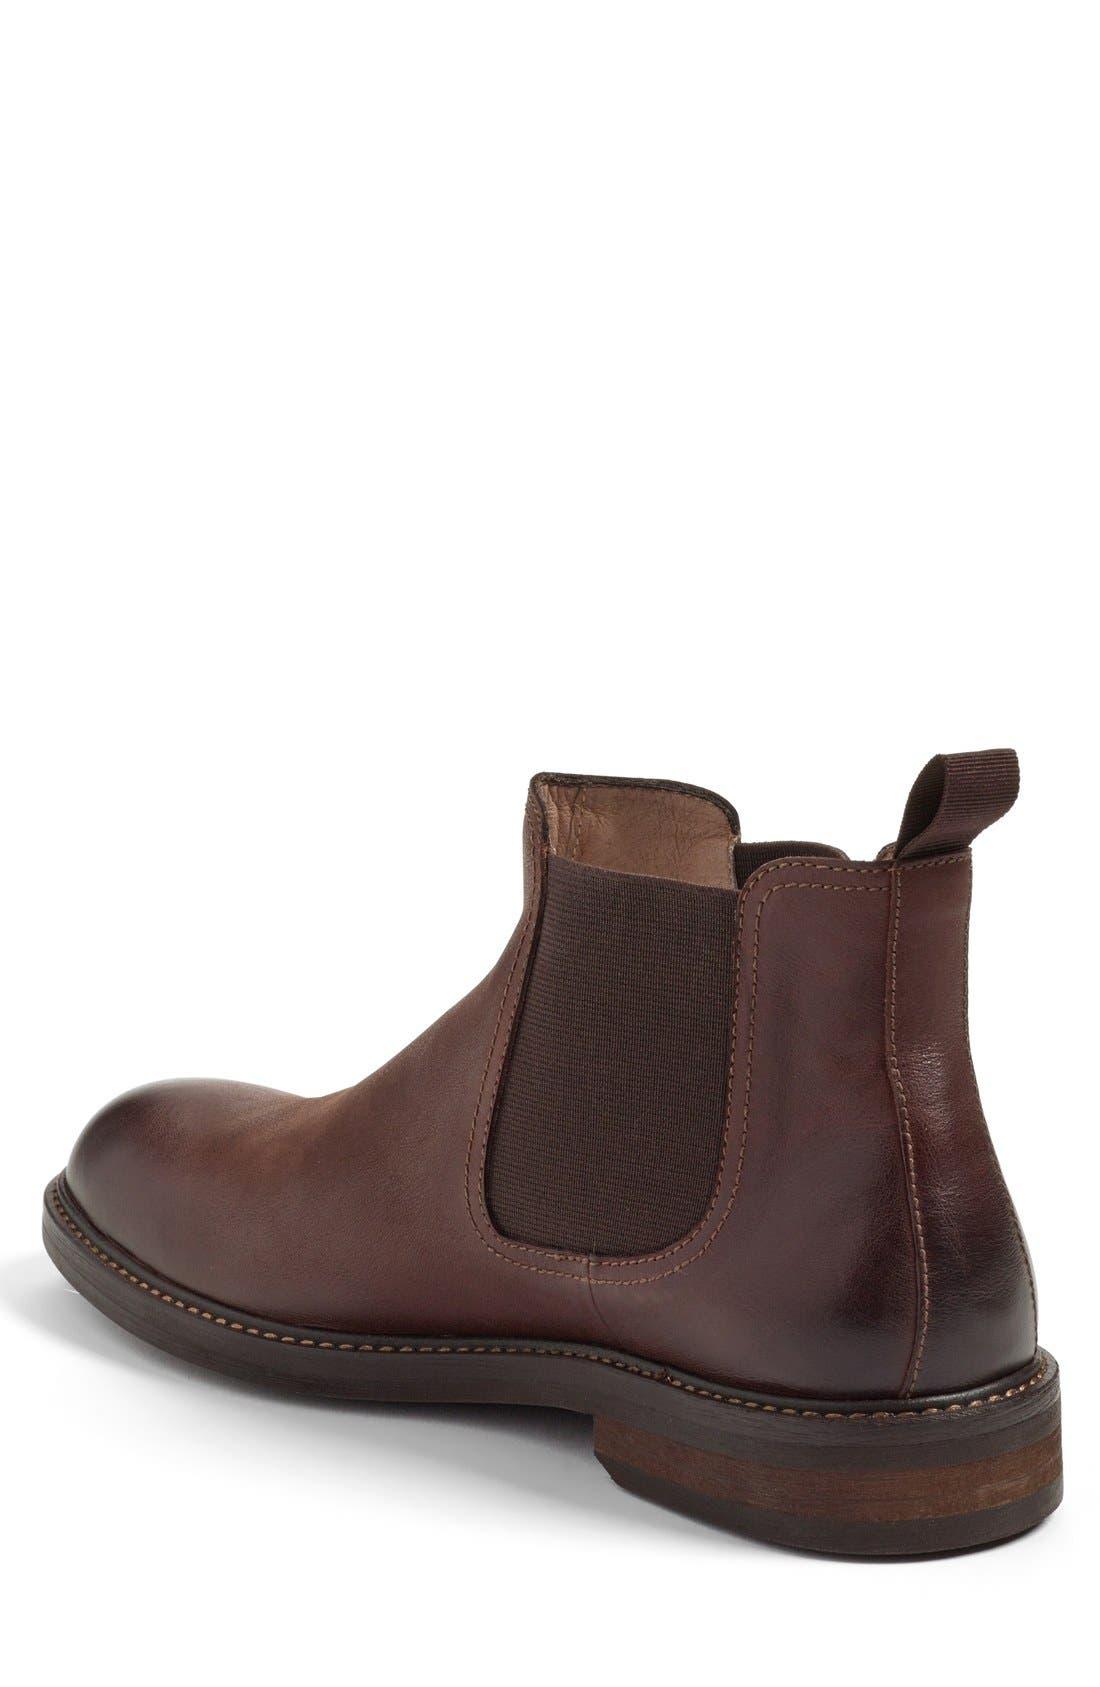 Horton Chelsea Boot,                             Alternate thumbnail 15, color,